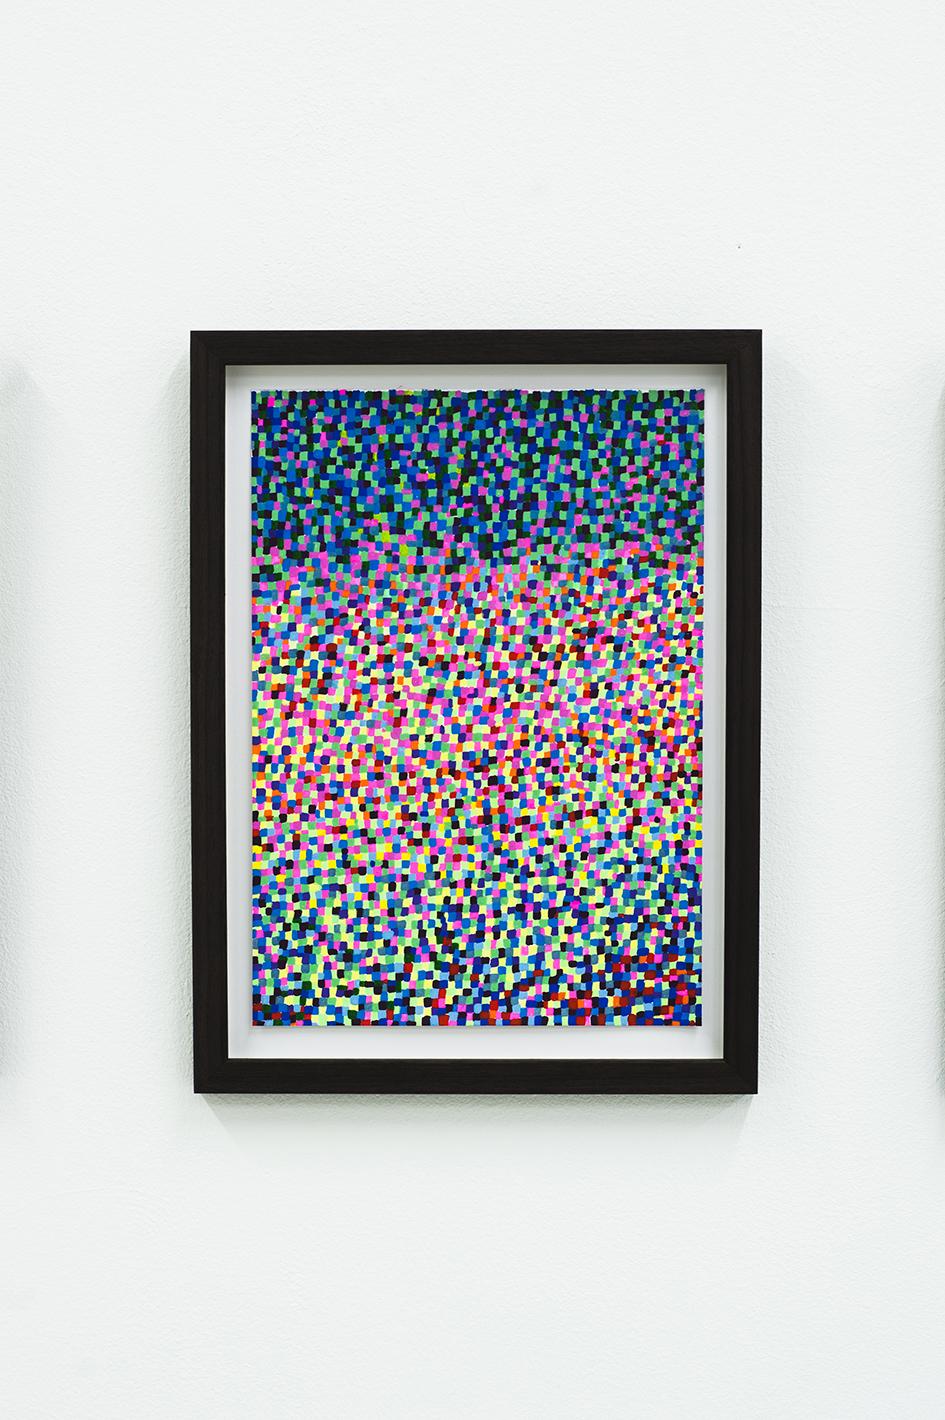 Mosaic drawings (2018)  35 x 26,2cm Private Collection  Photo: Jan Inge Haga